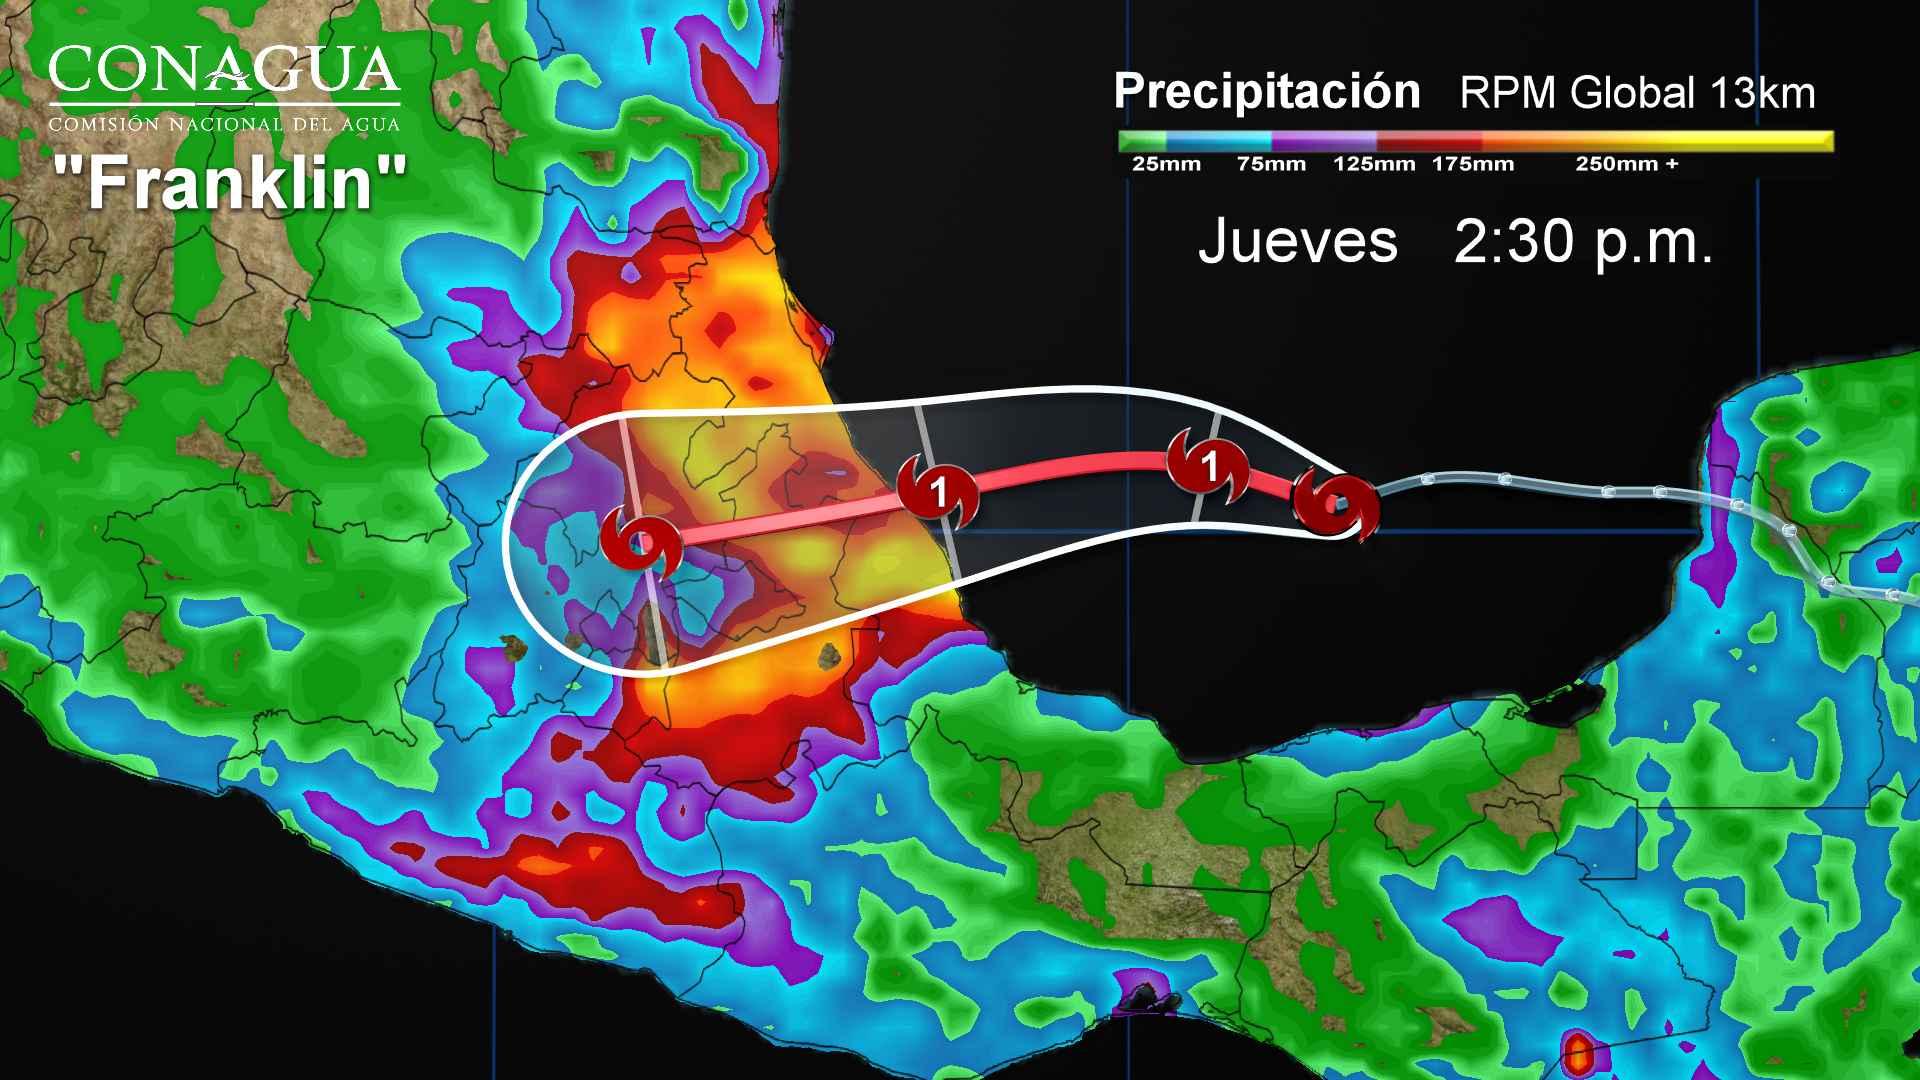 Lluvias muy fuertes se pronostican para Tlaxcala